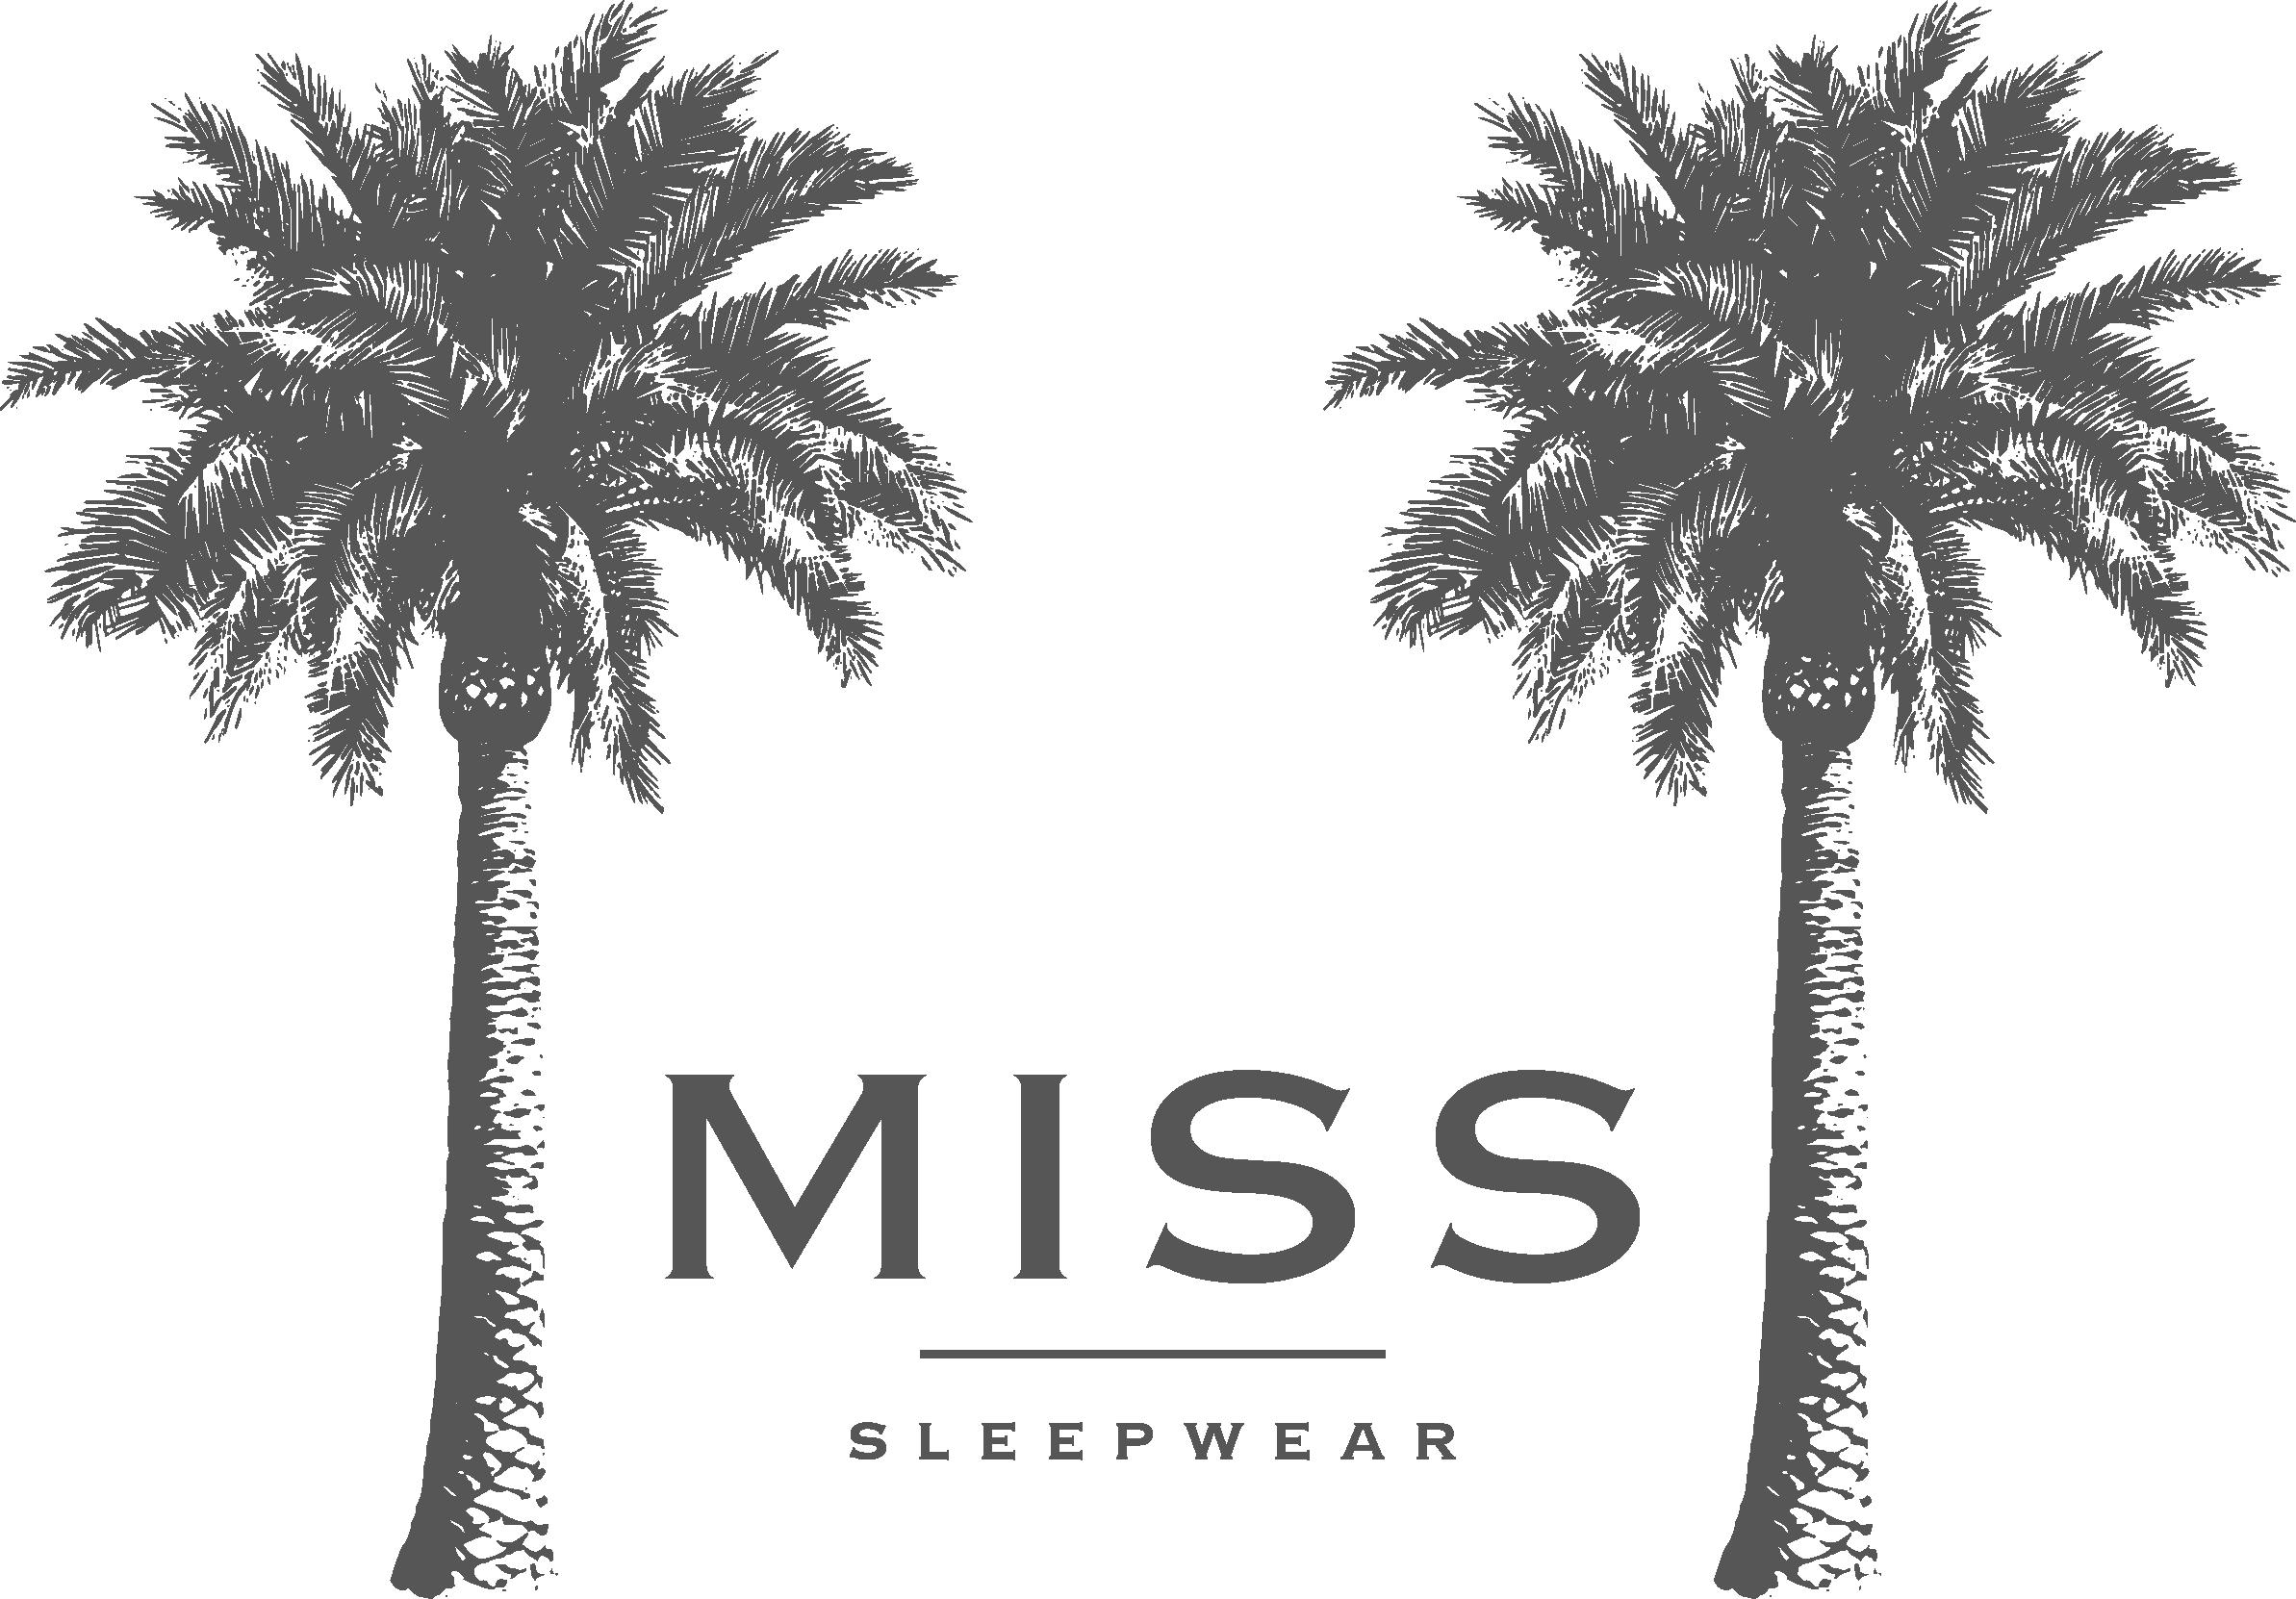 Create a logo for Missy's sleepwear - think palm trees!